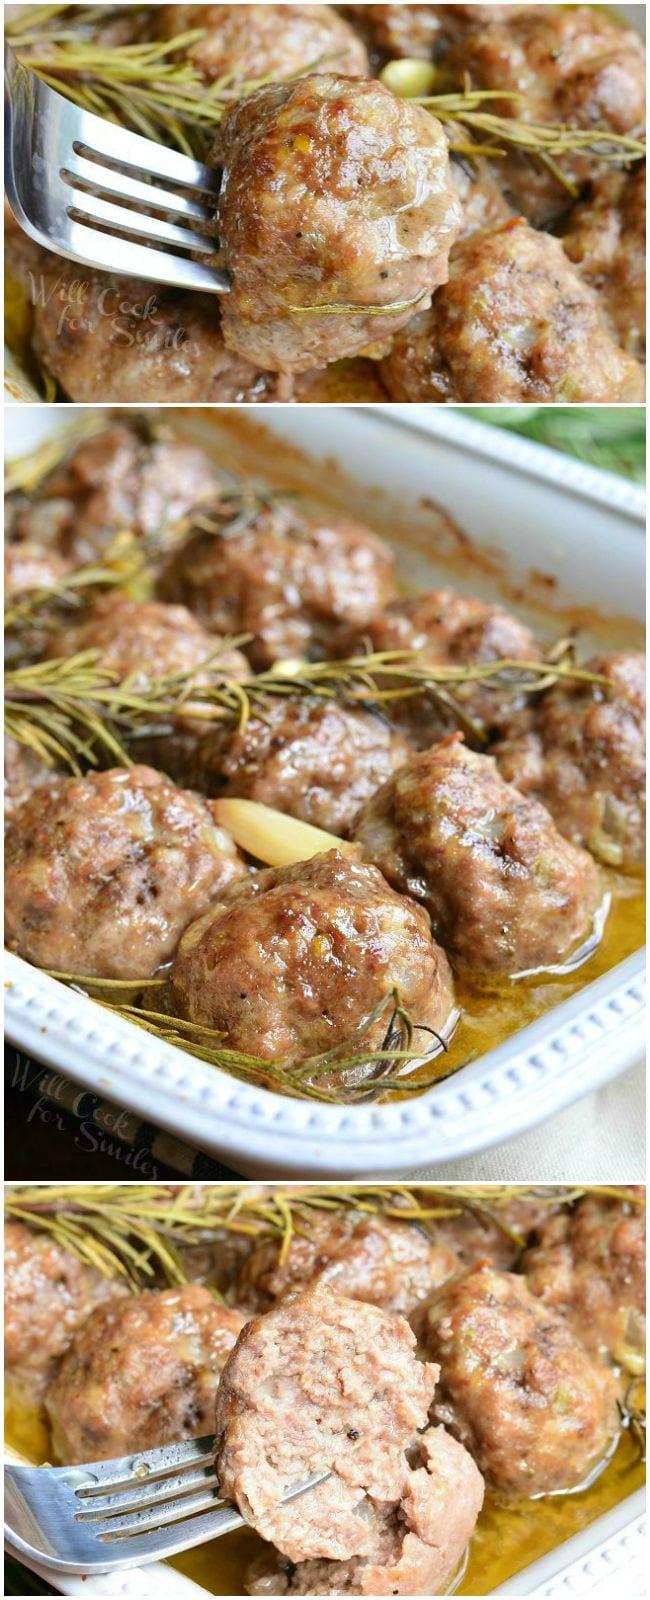 Roasted Garlic Rosemary Baked Meatballs 7 from willcookforsmiles.com